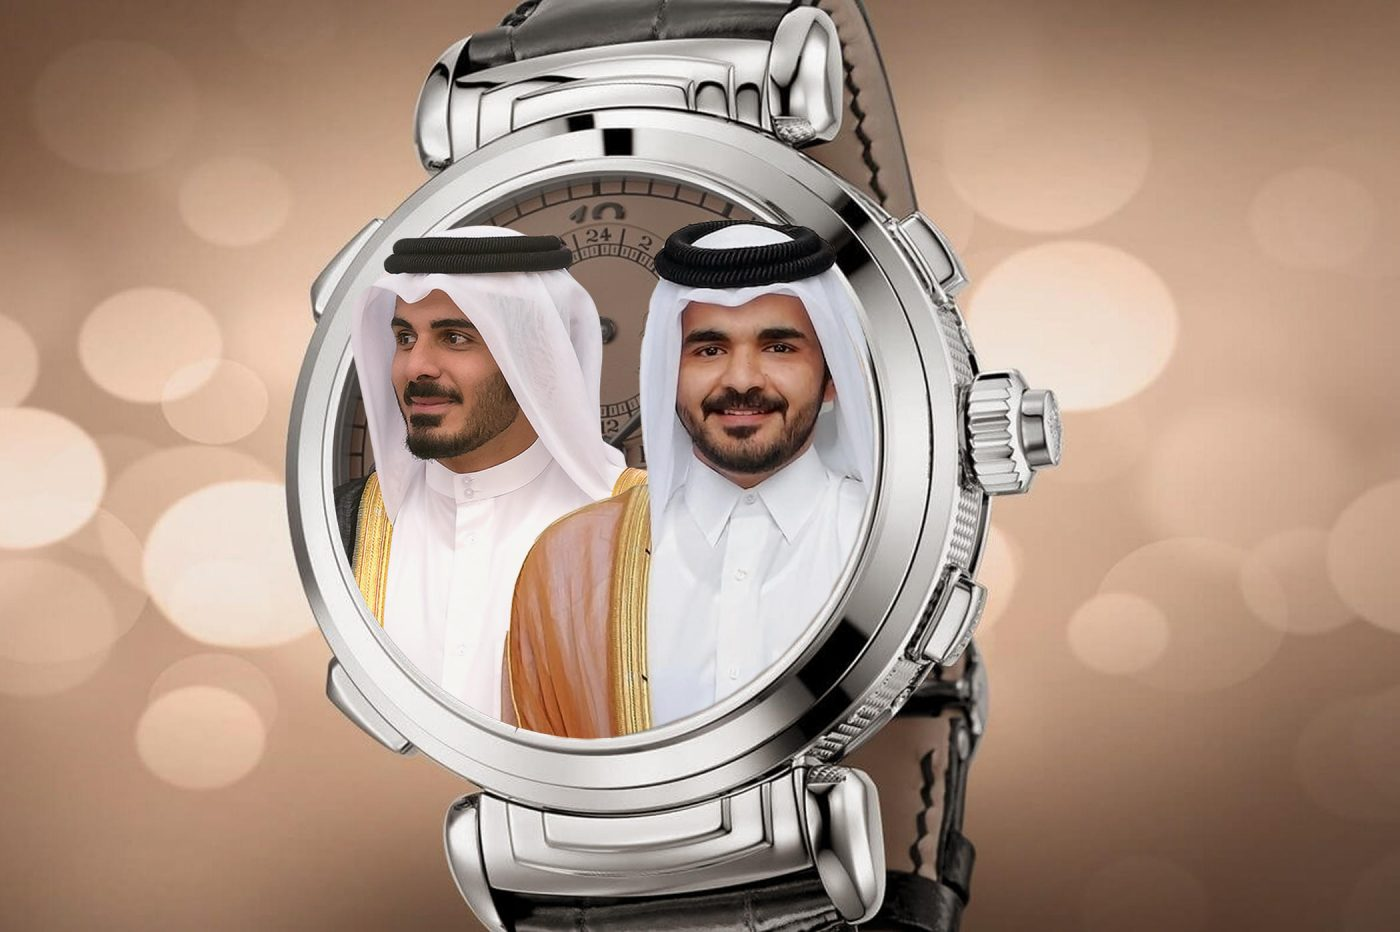 Timebloid Petro-watches aka what is worn by Qatar sheikh royalties – Joaan Bin Hamad & Khalifa Bin Hamad